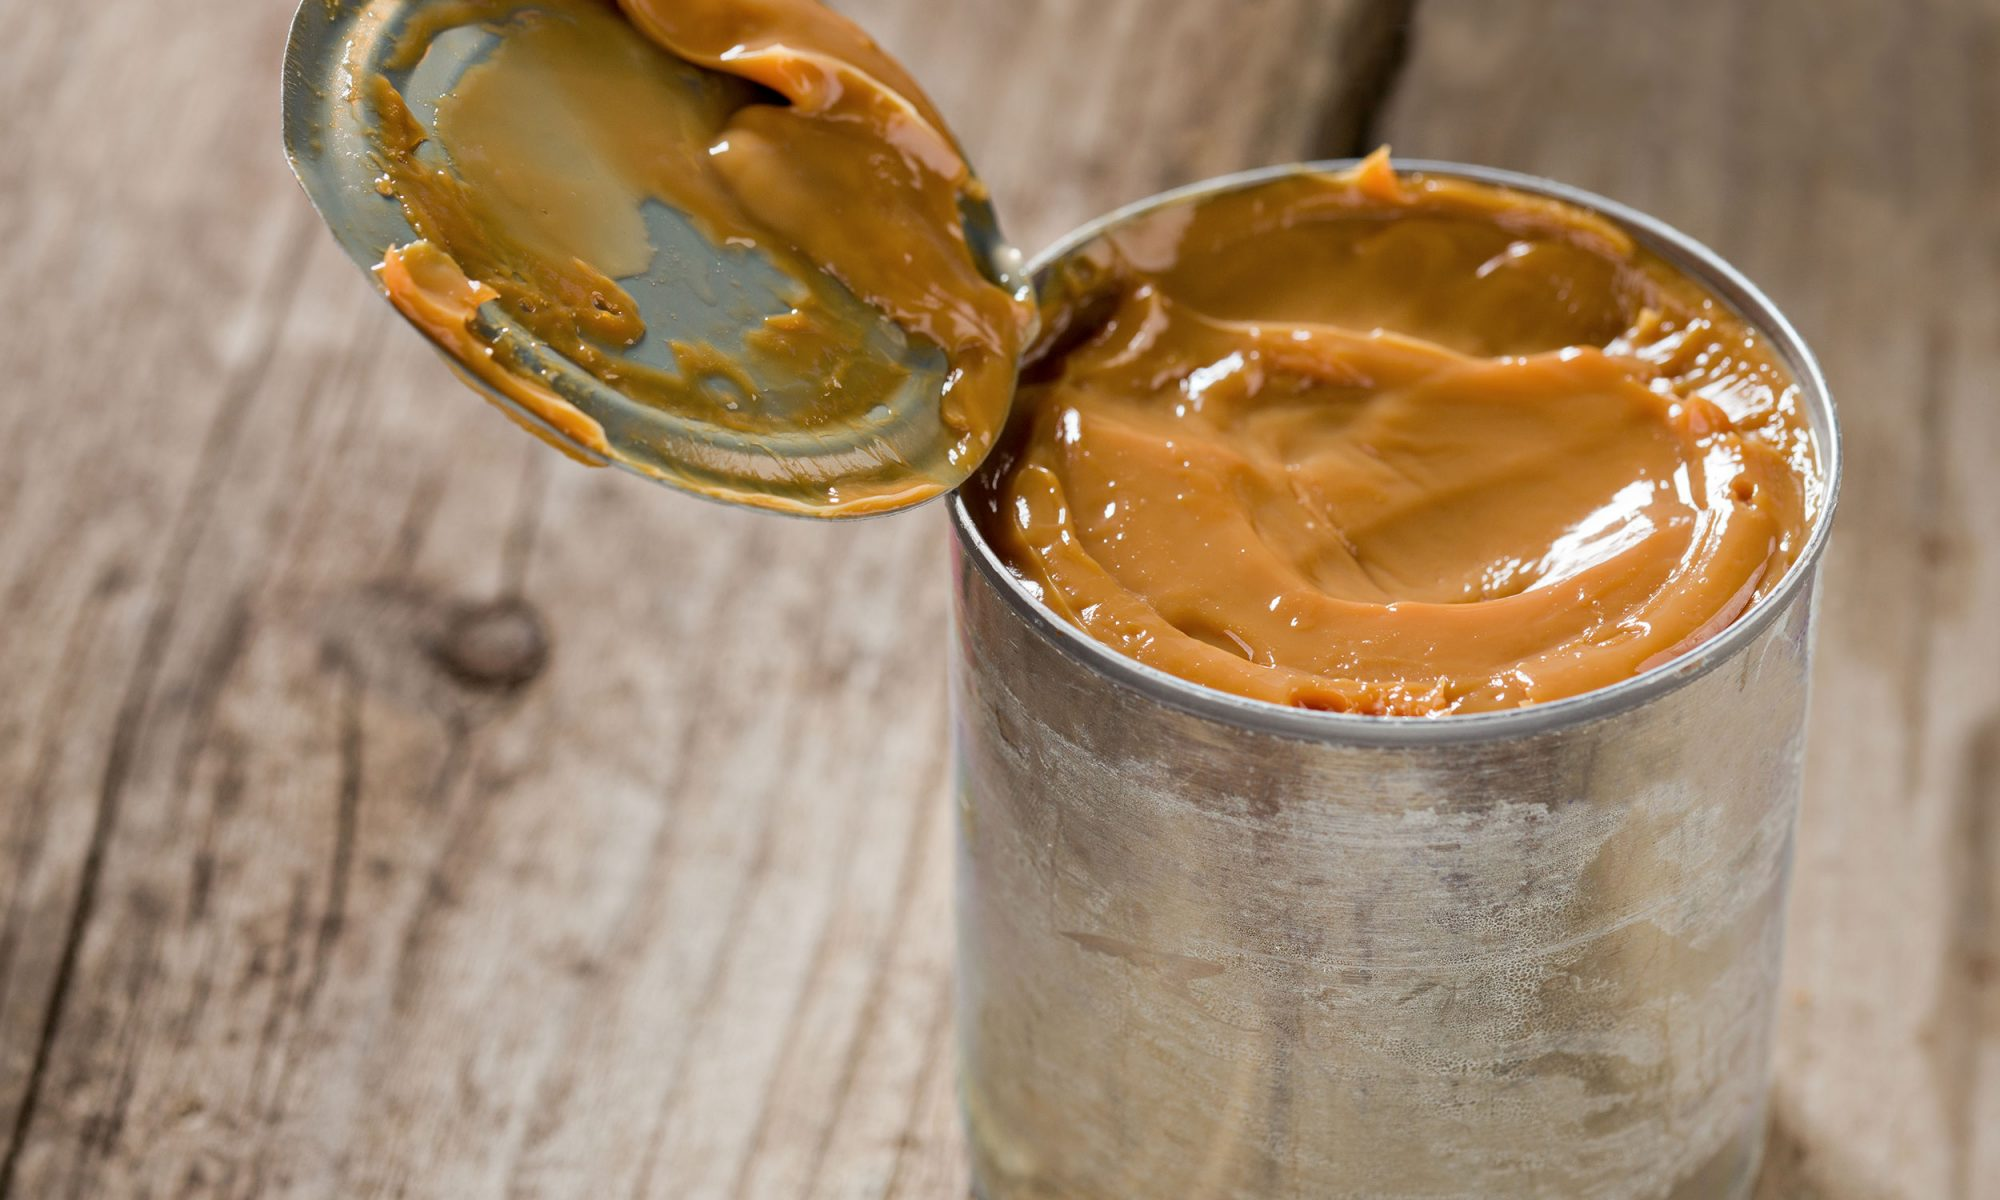 Transform a Can of Sweetened Condensed Milk Into Dulce de Leche